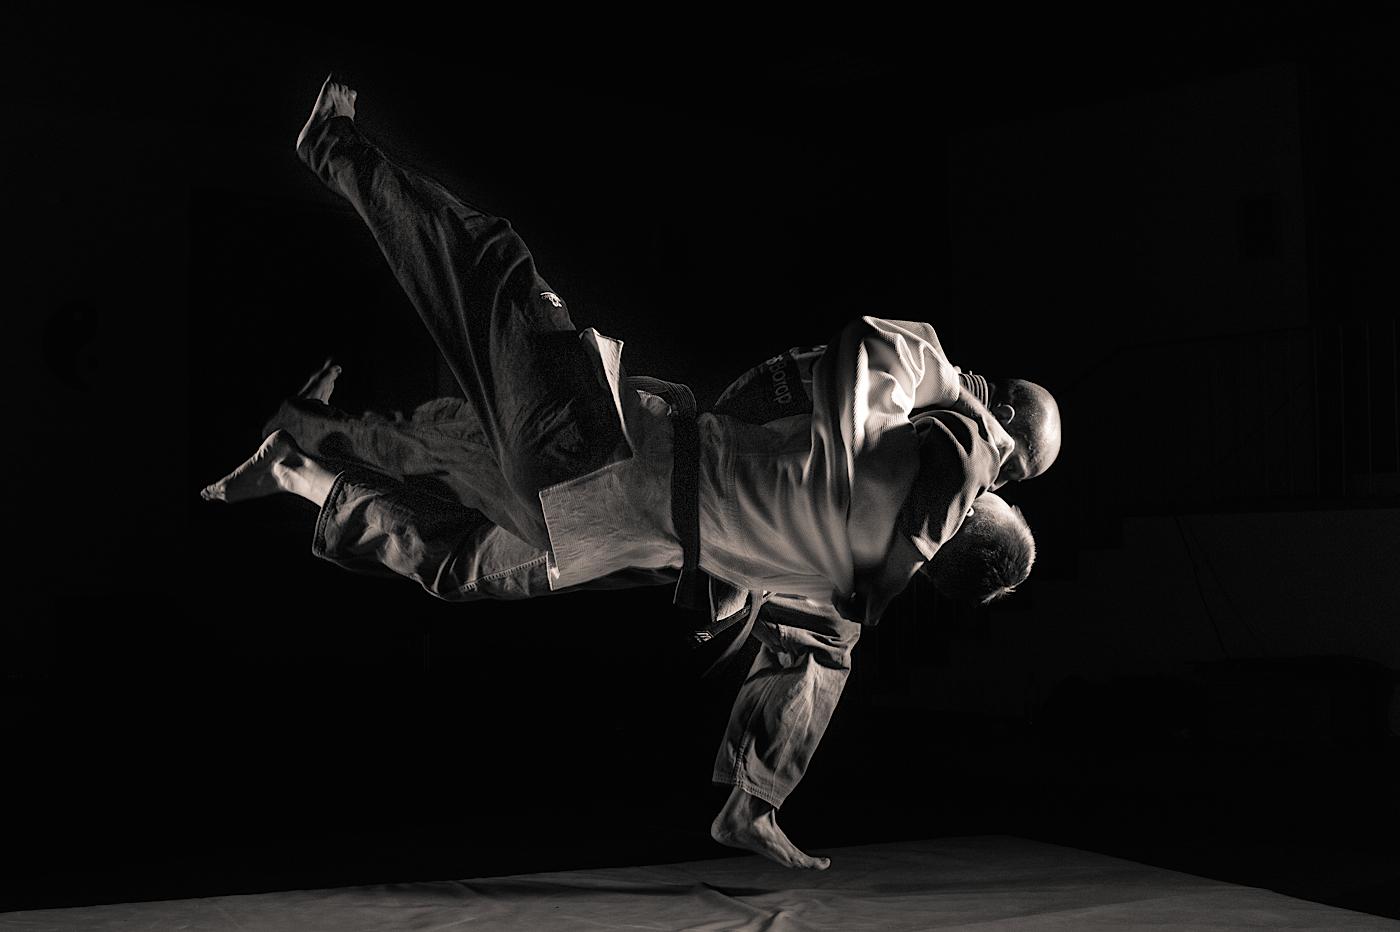 Judo Background Judo shootingwith strobes 1400x932